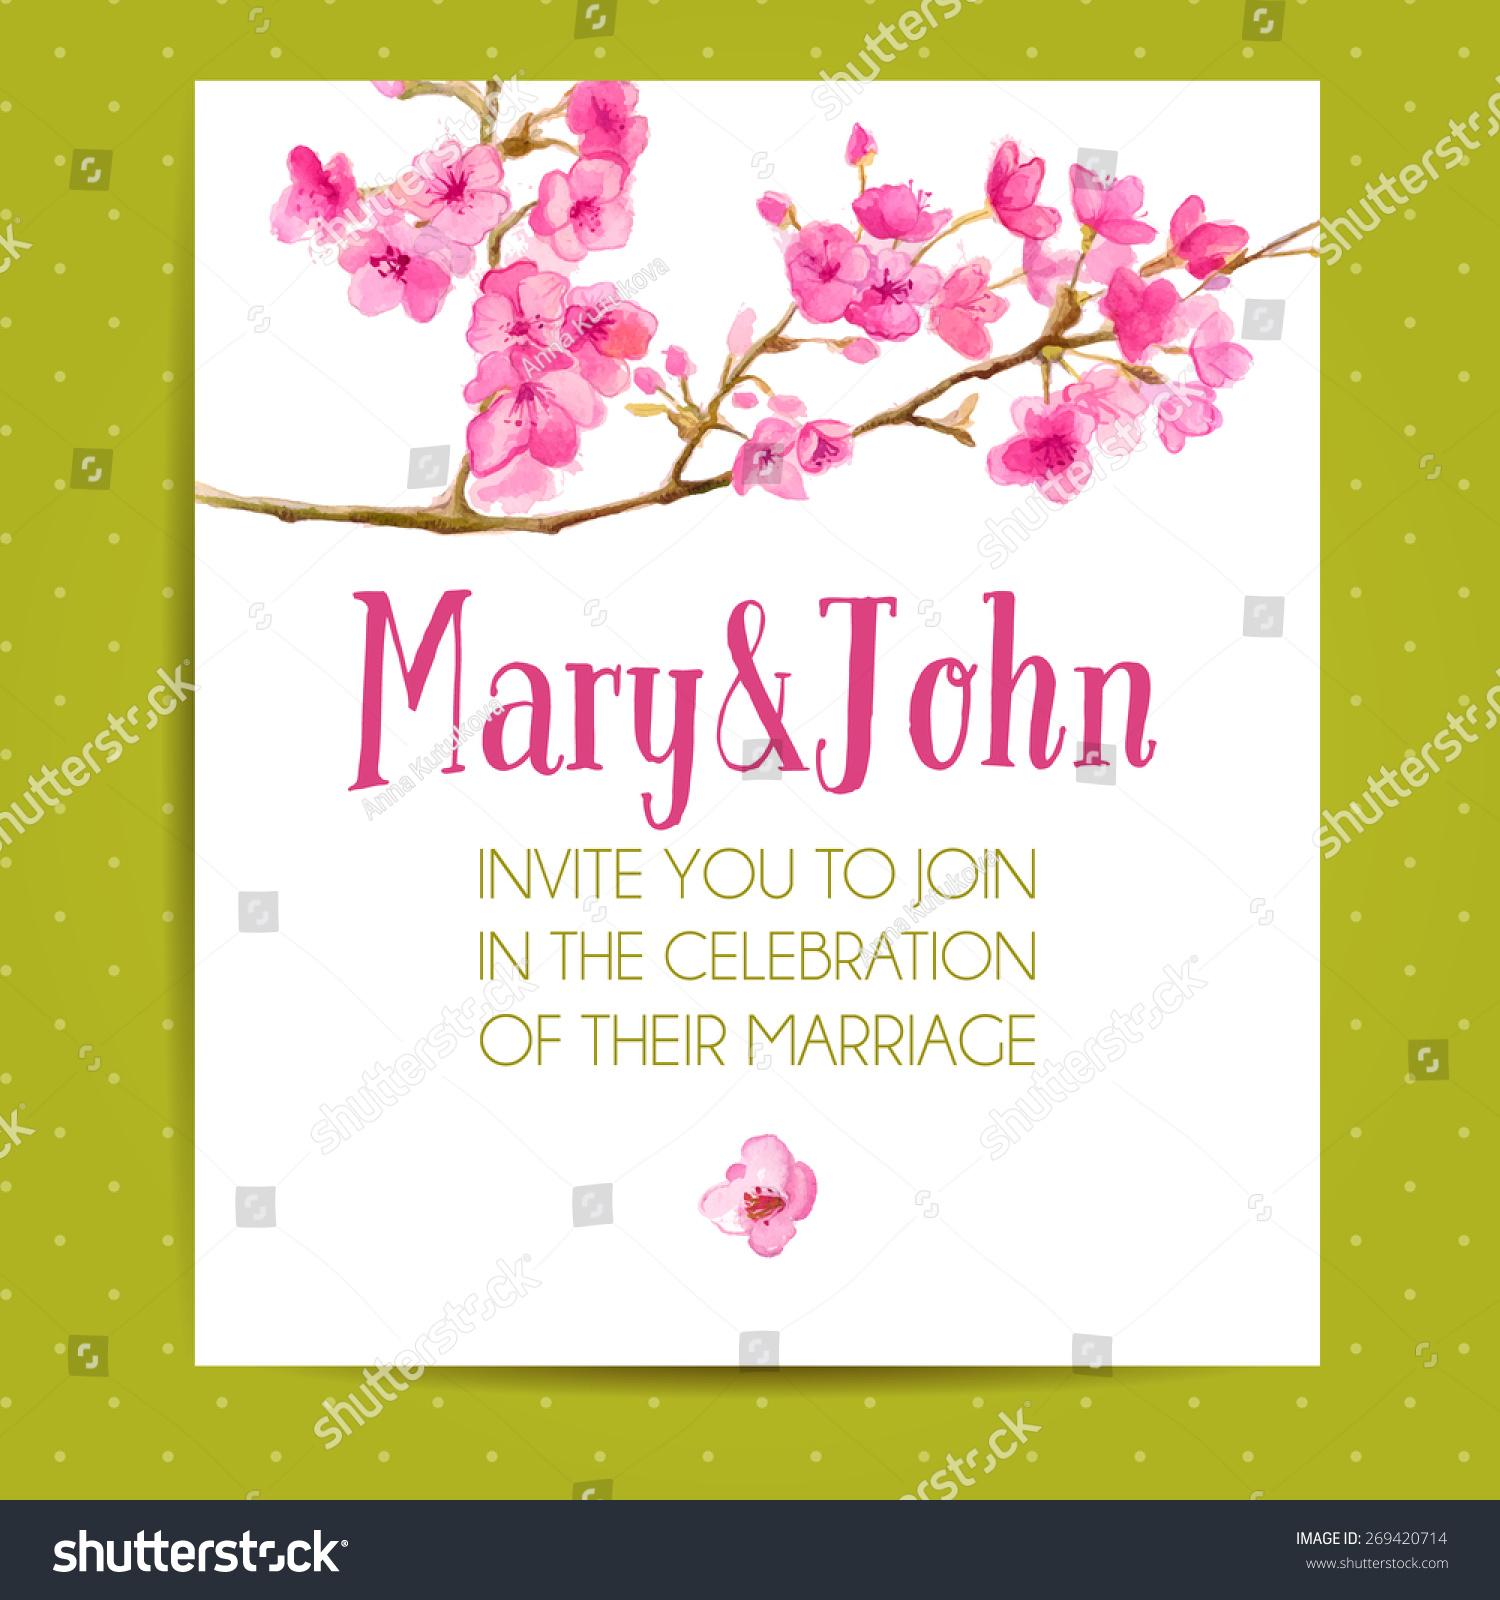 Elegant Cherry Blossom Wedding Invites With Response Card EWI064 ...